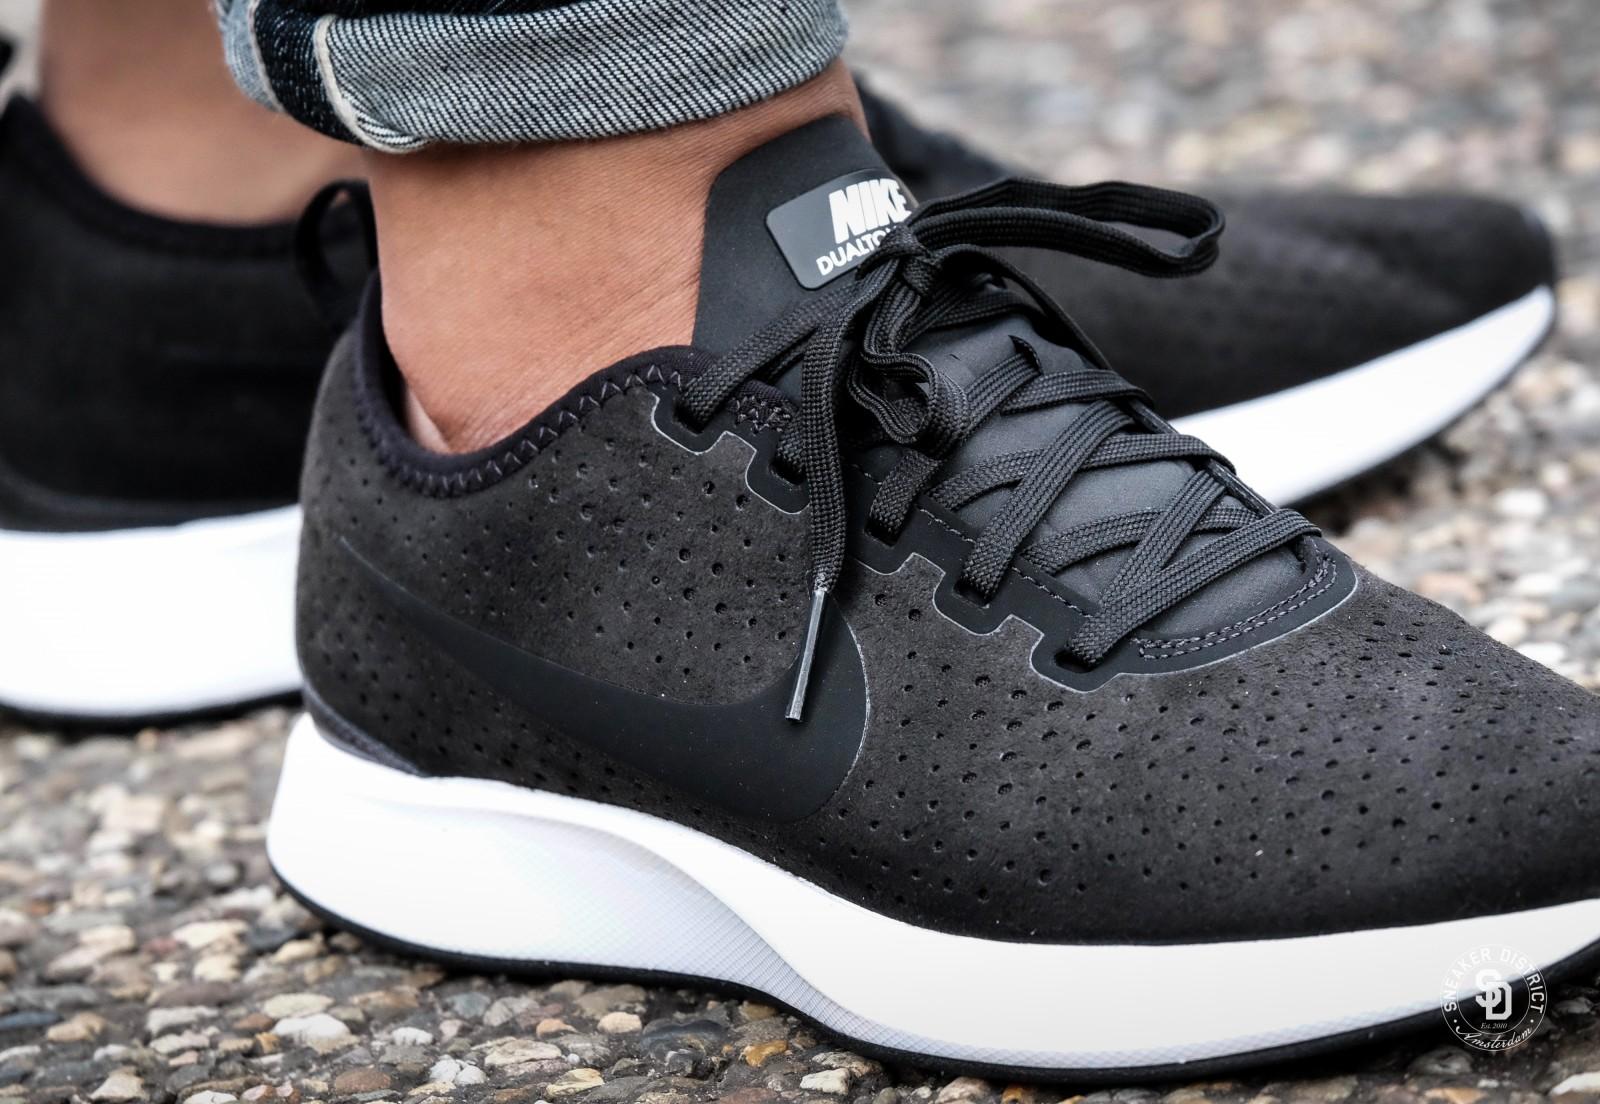 On Sale: Nike Dualtone Racer Premium